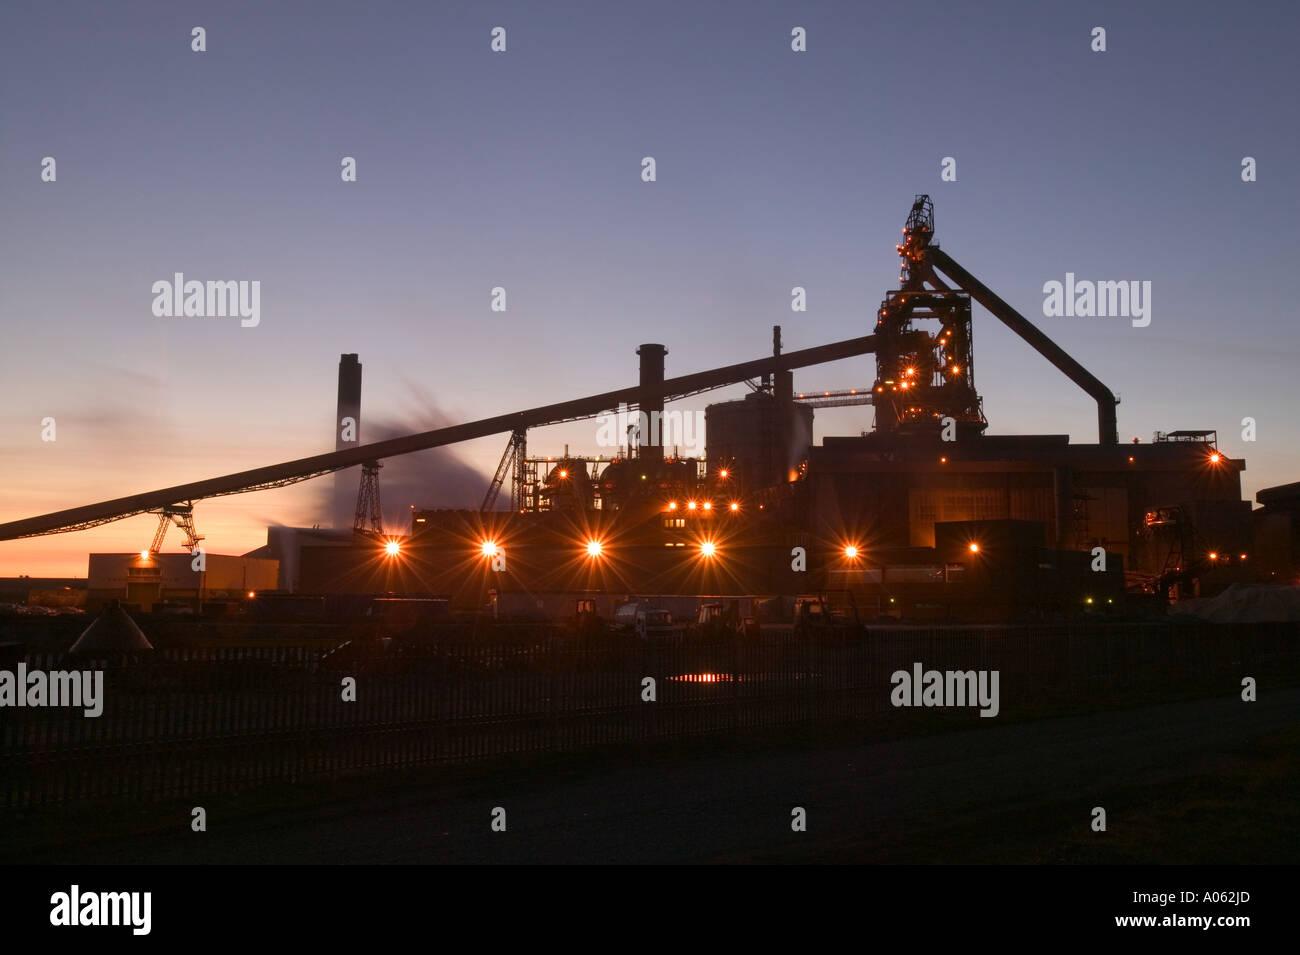 Corus steel works on Teeside, England - Stock Image